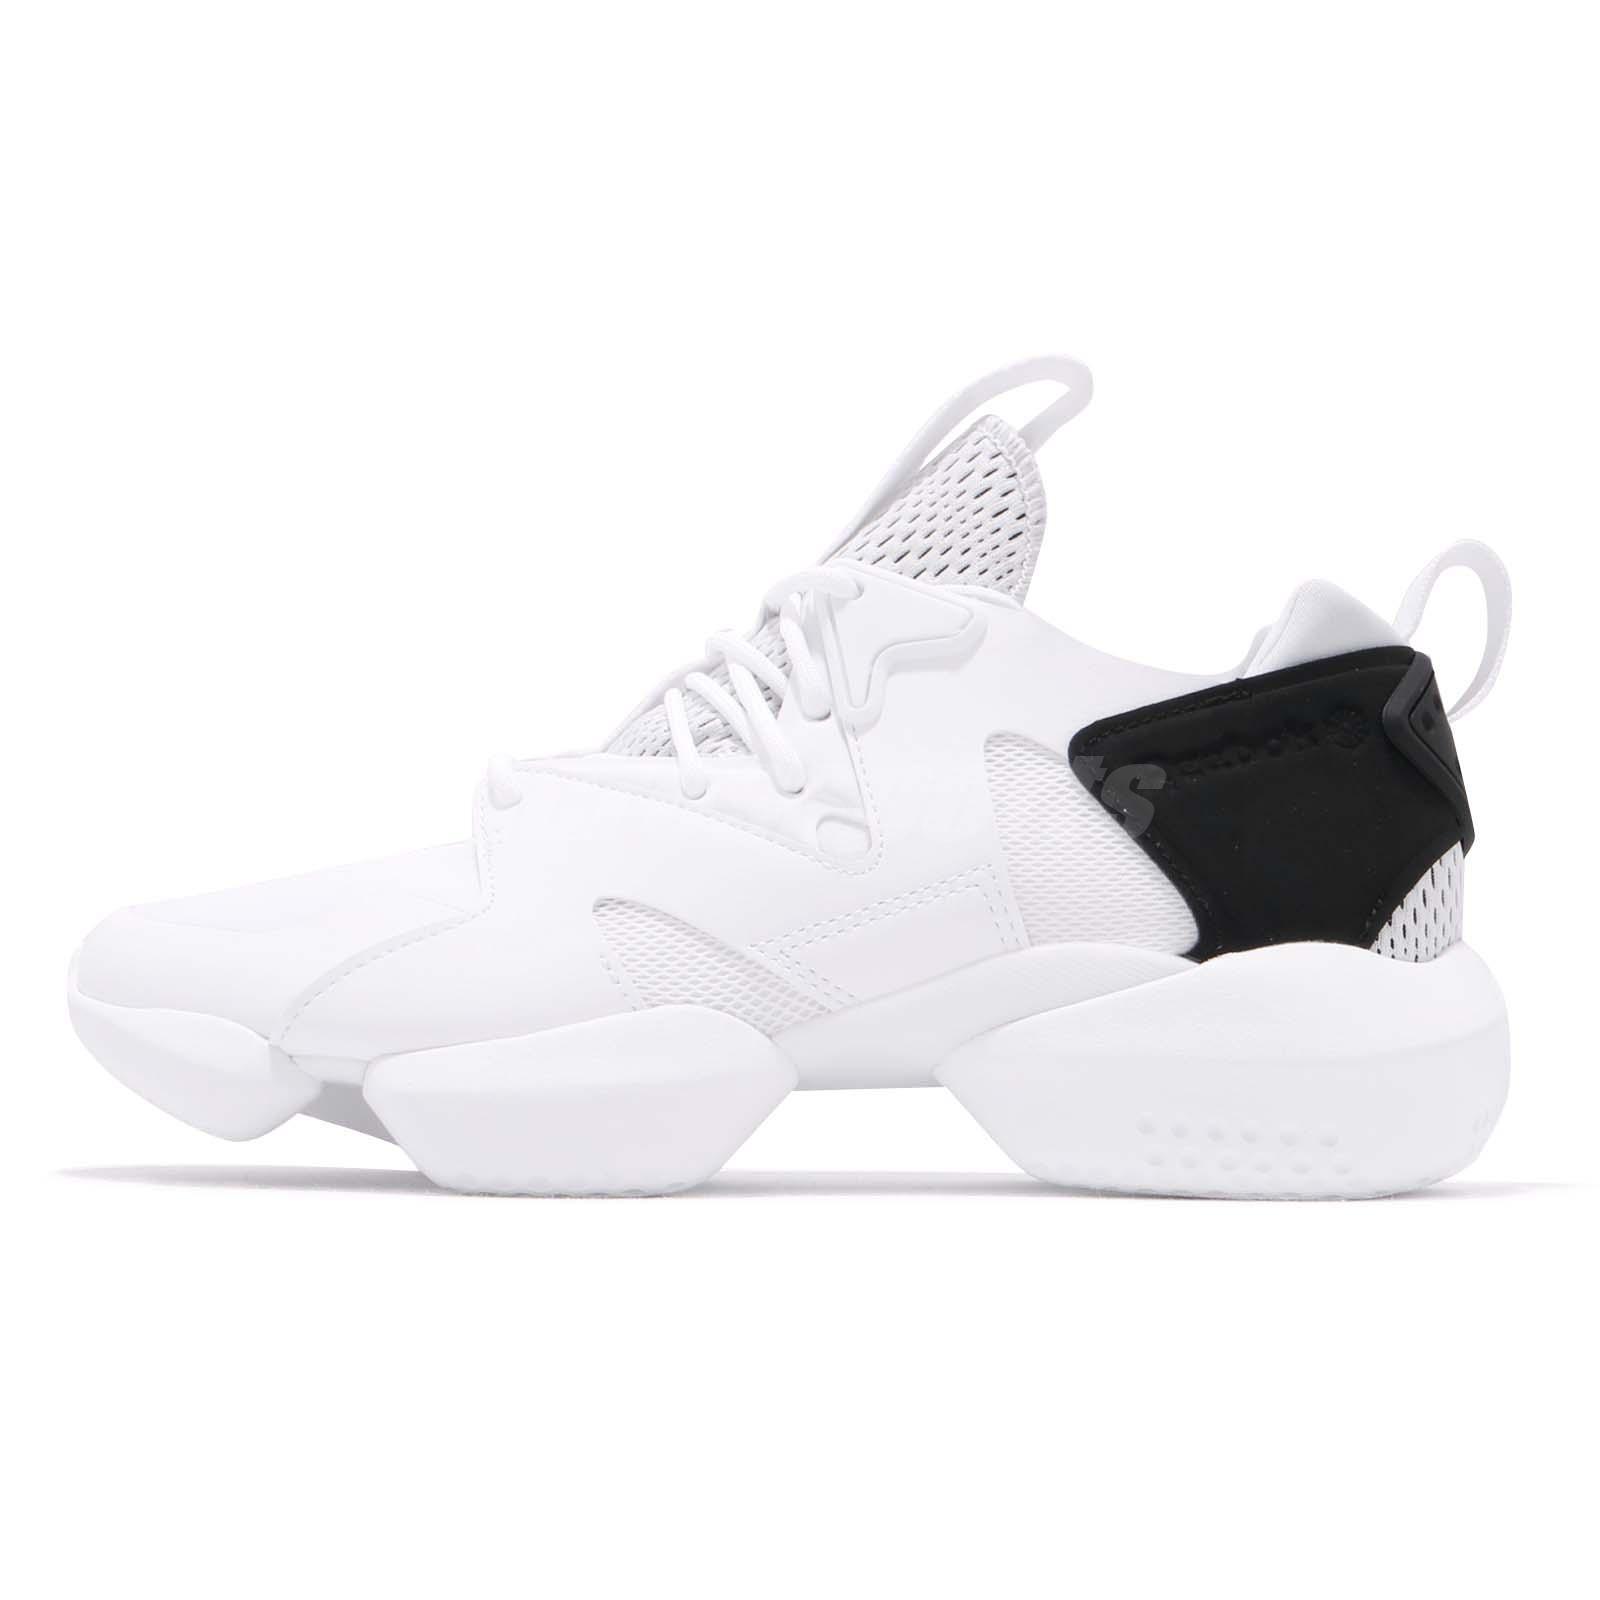 803711bb27e Reebok 3D OP. Lite White Black Men Running Lifestyle Shoes Sneakers DV4272